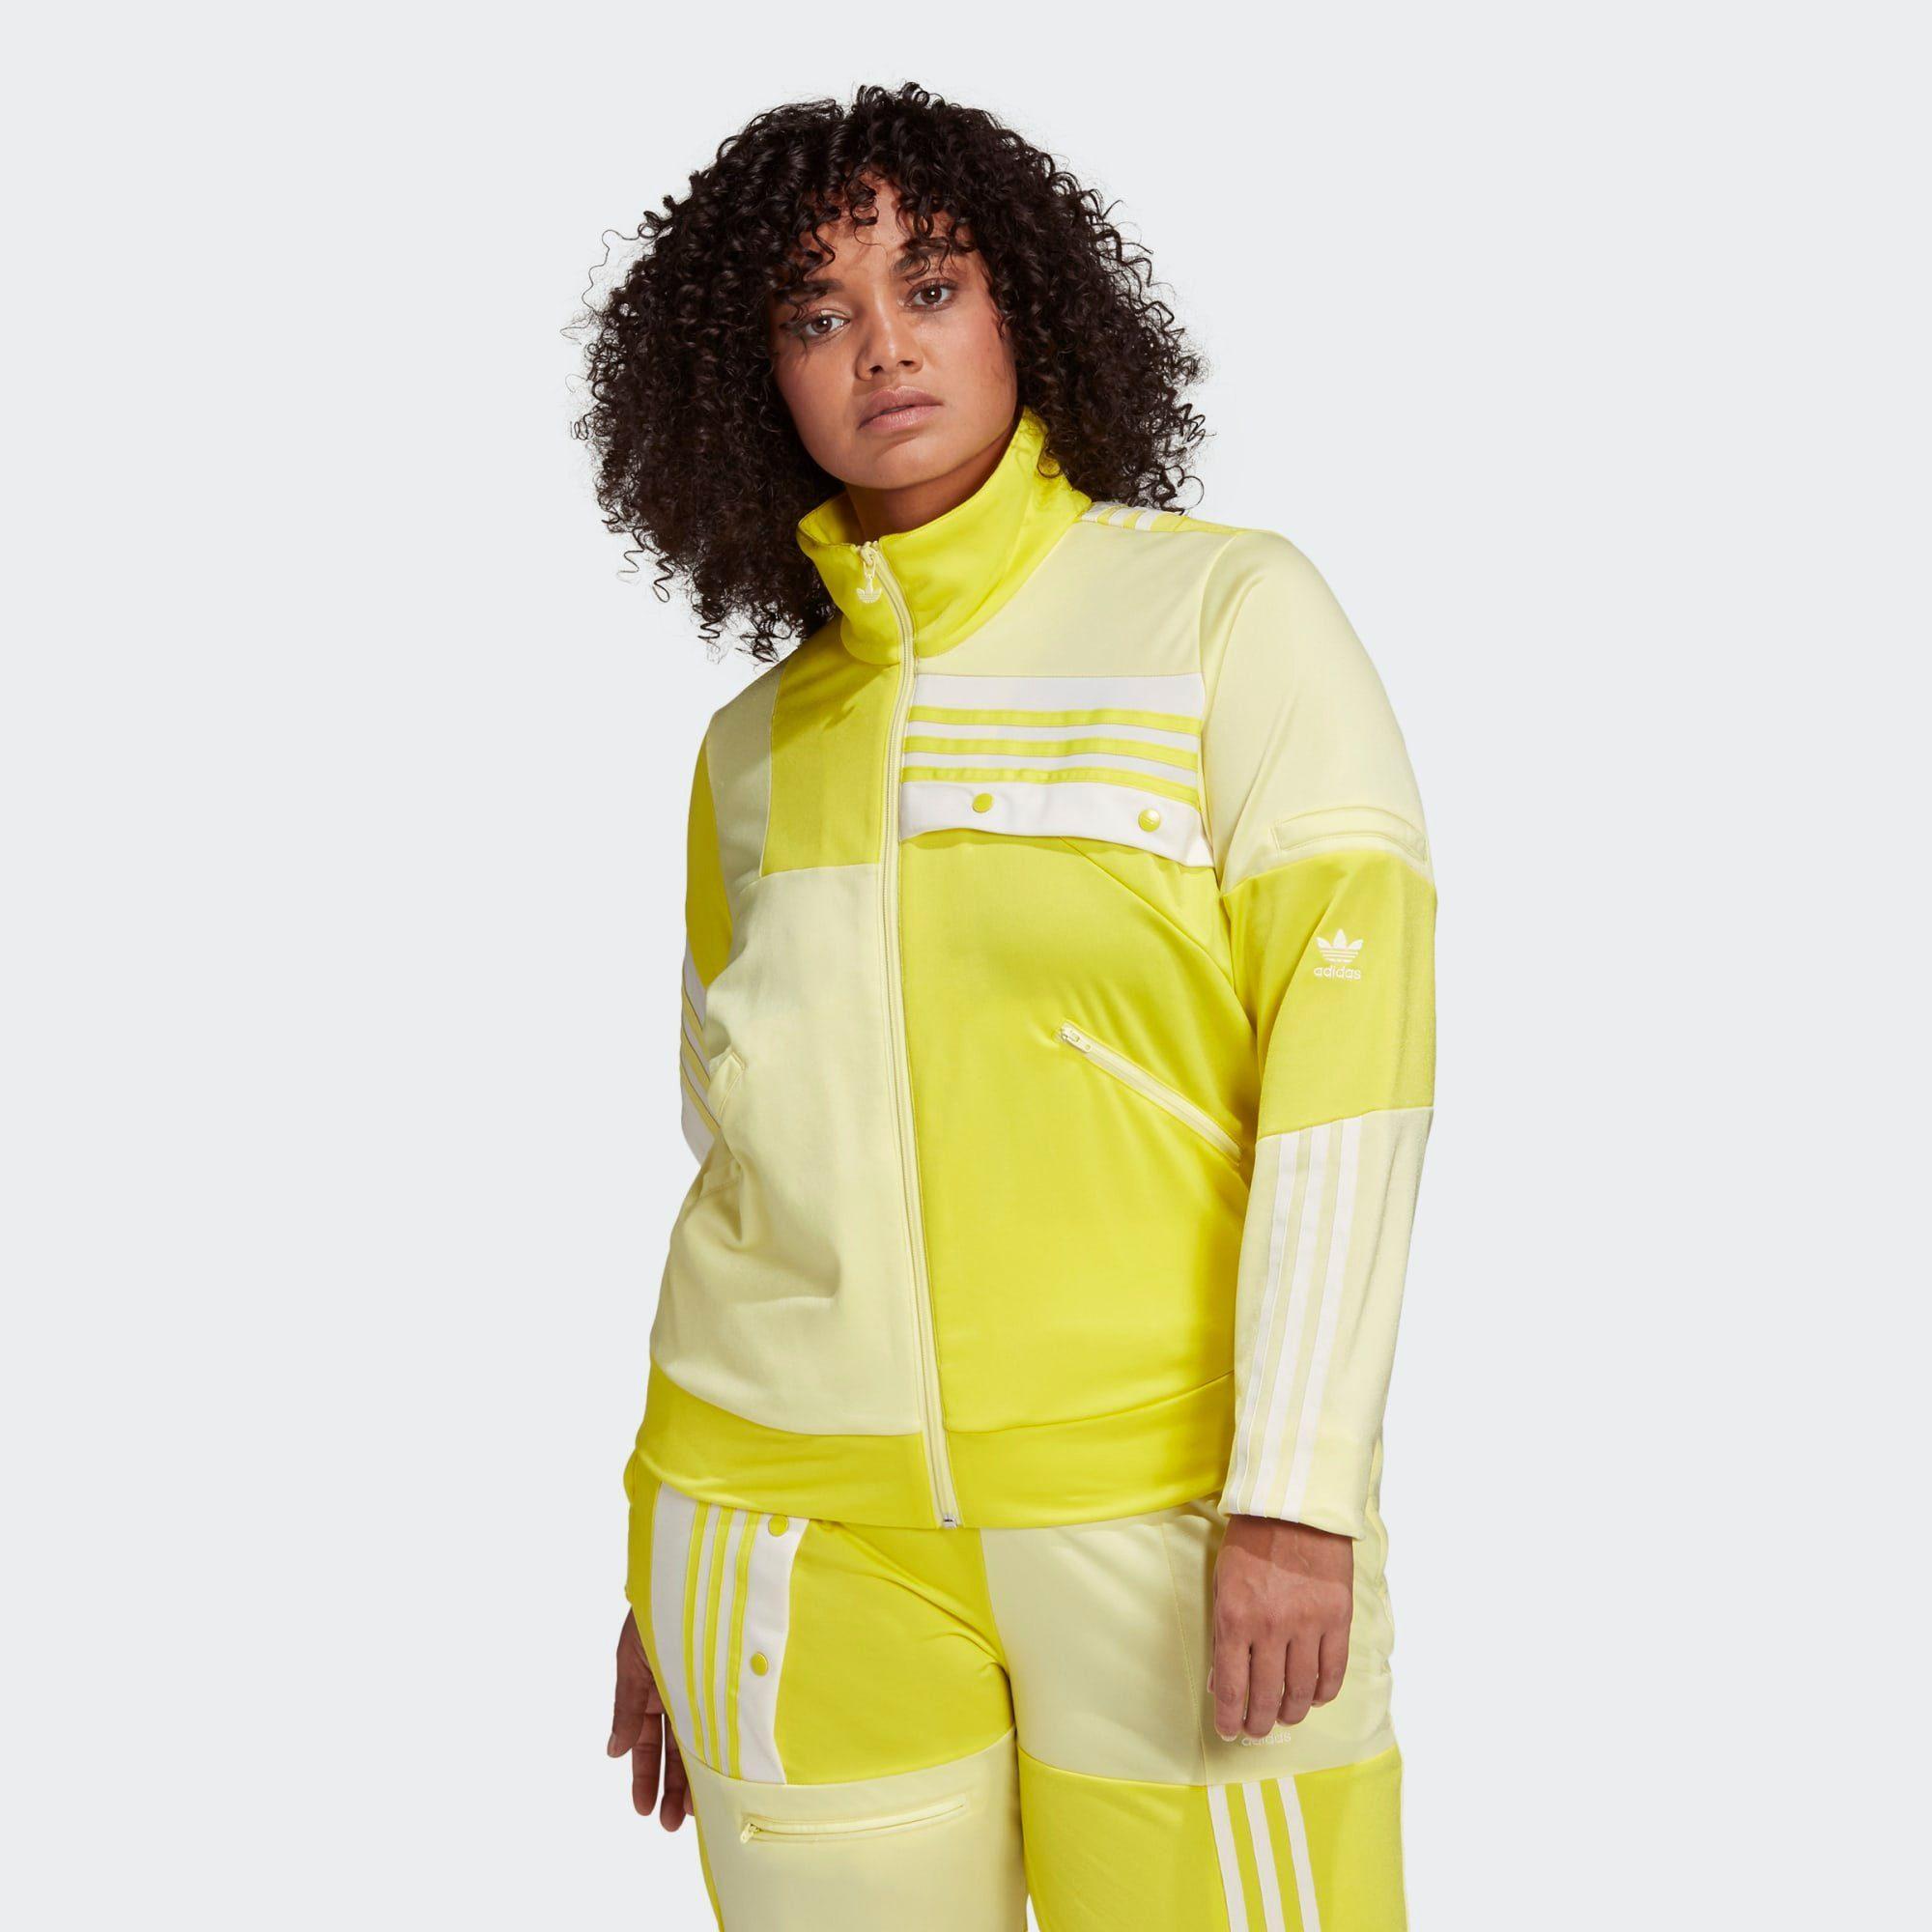 adidas Originals Sweatjacke Daniëlle Cathari Originals Jacke